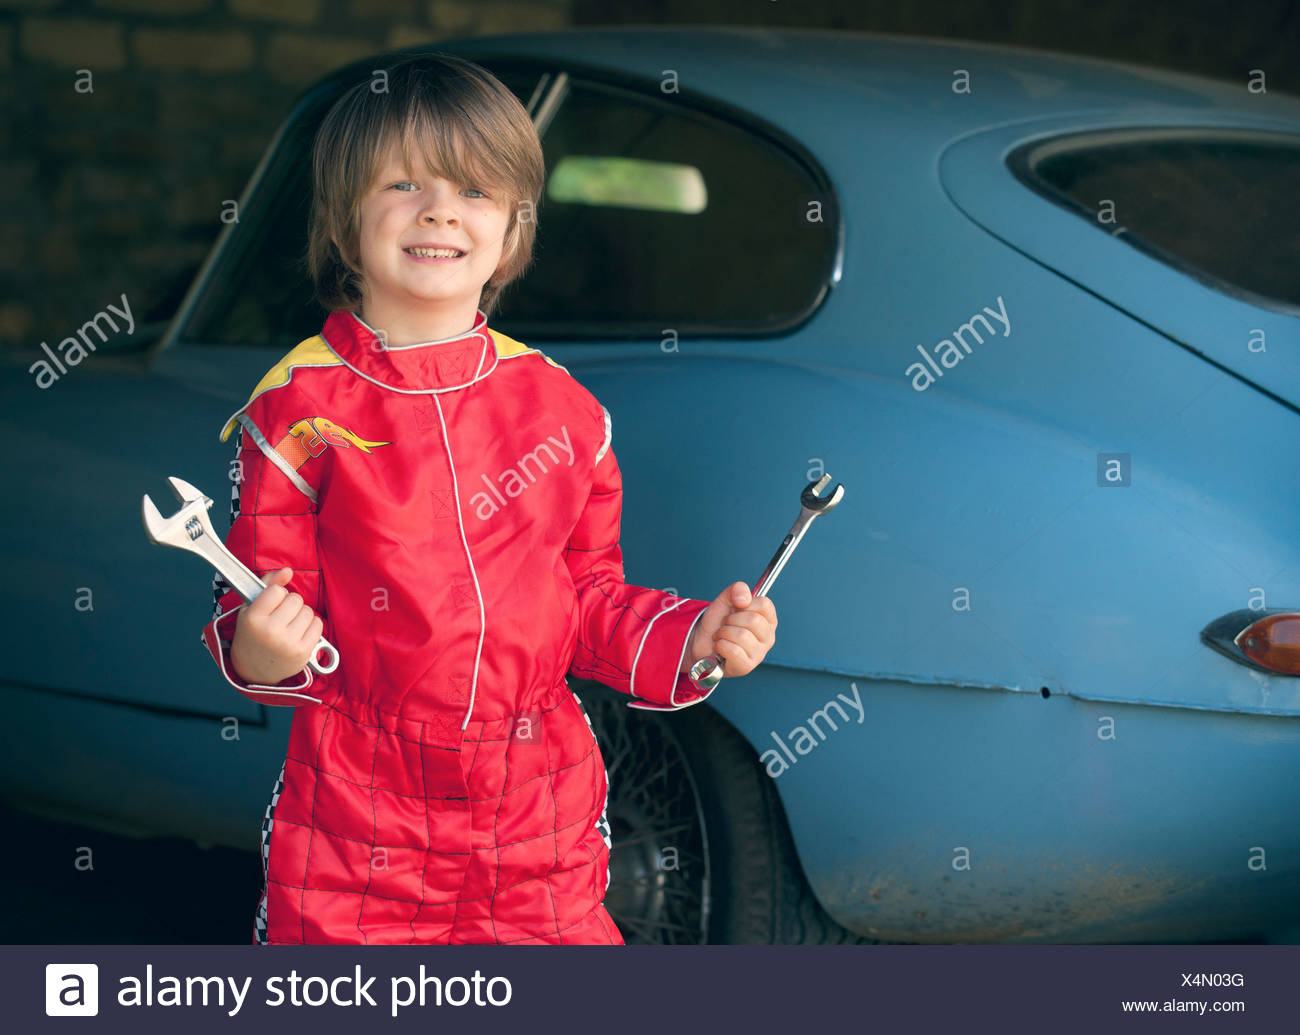 Boy Wearing Race Car Driver Costume Stock Photo 278285604 Alamy